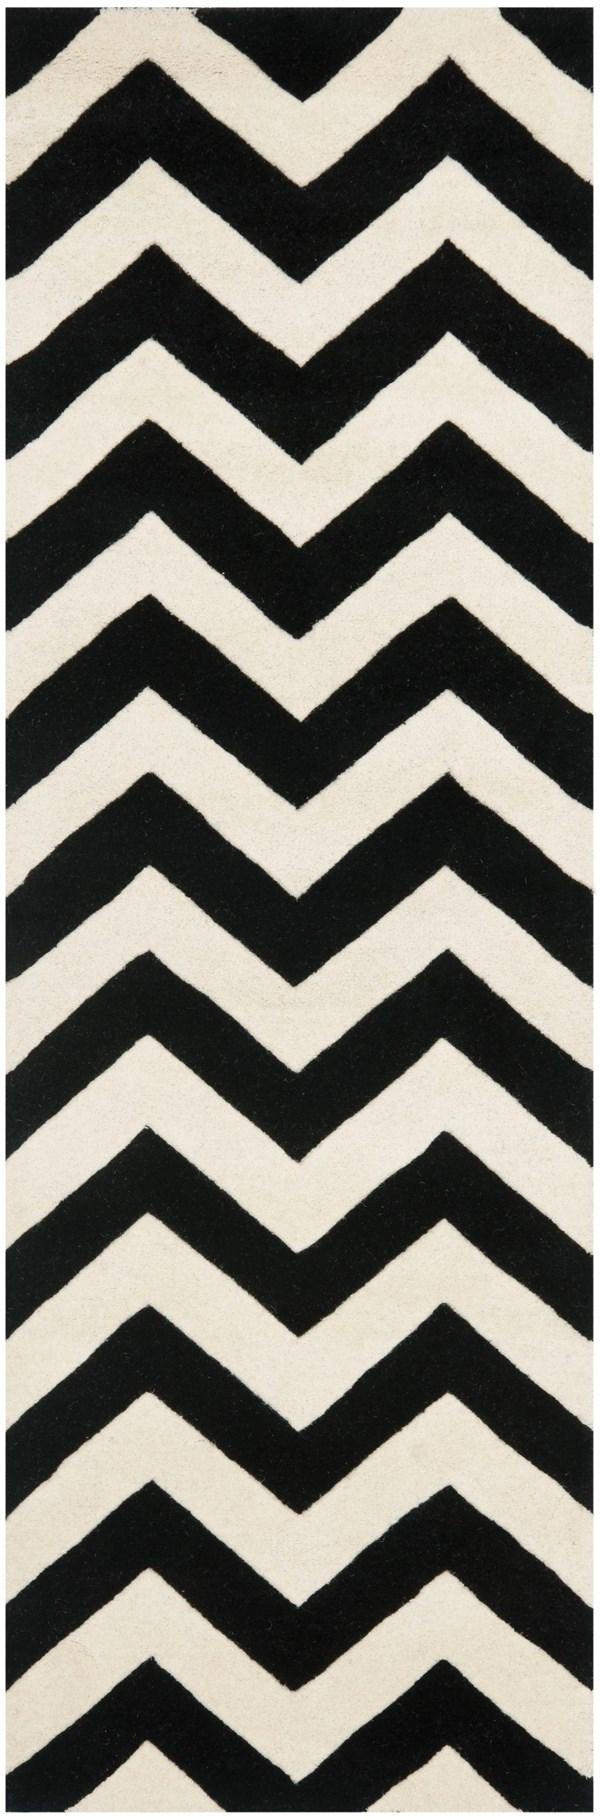 Ivory, Black (A) Chevron Area Rug